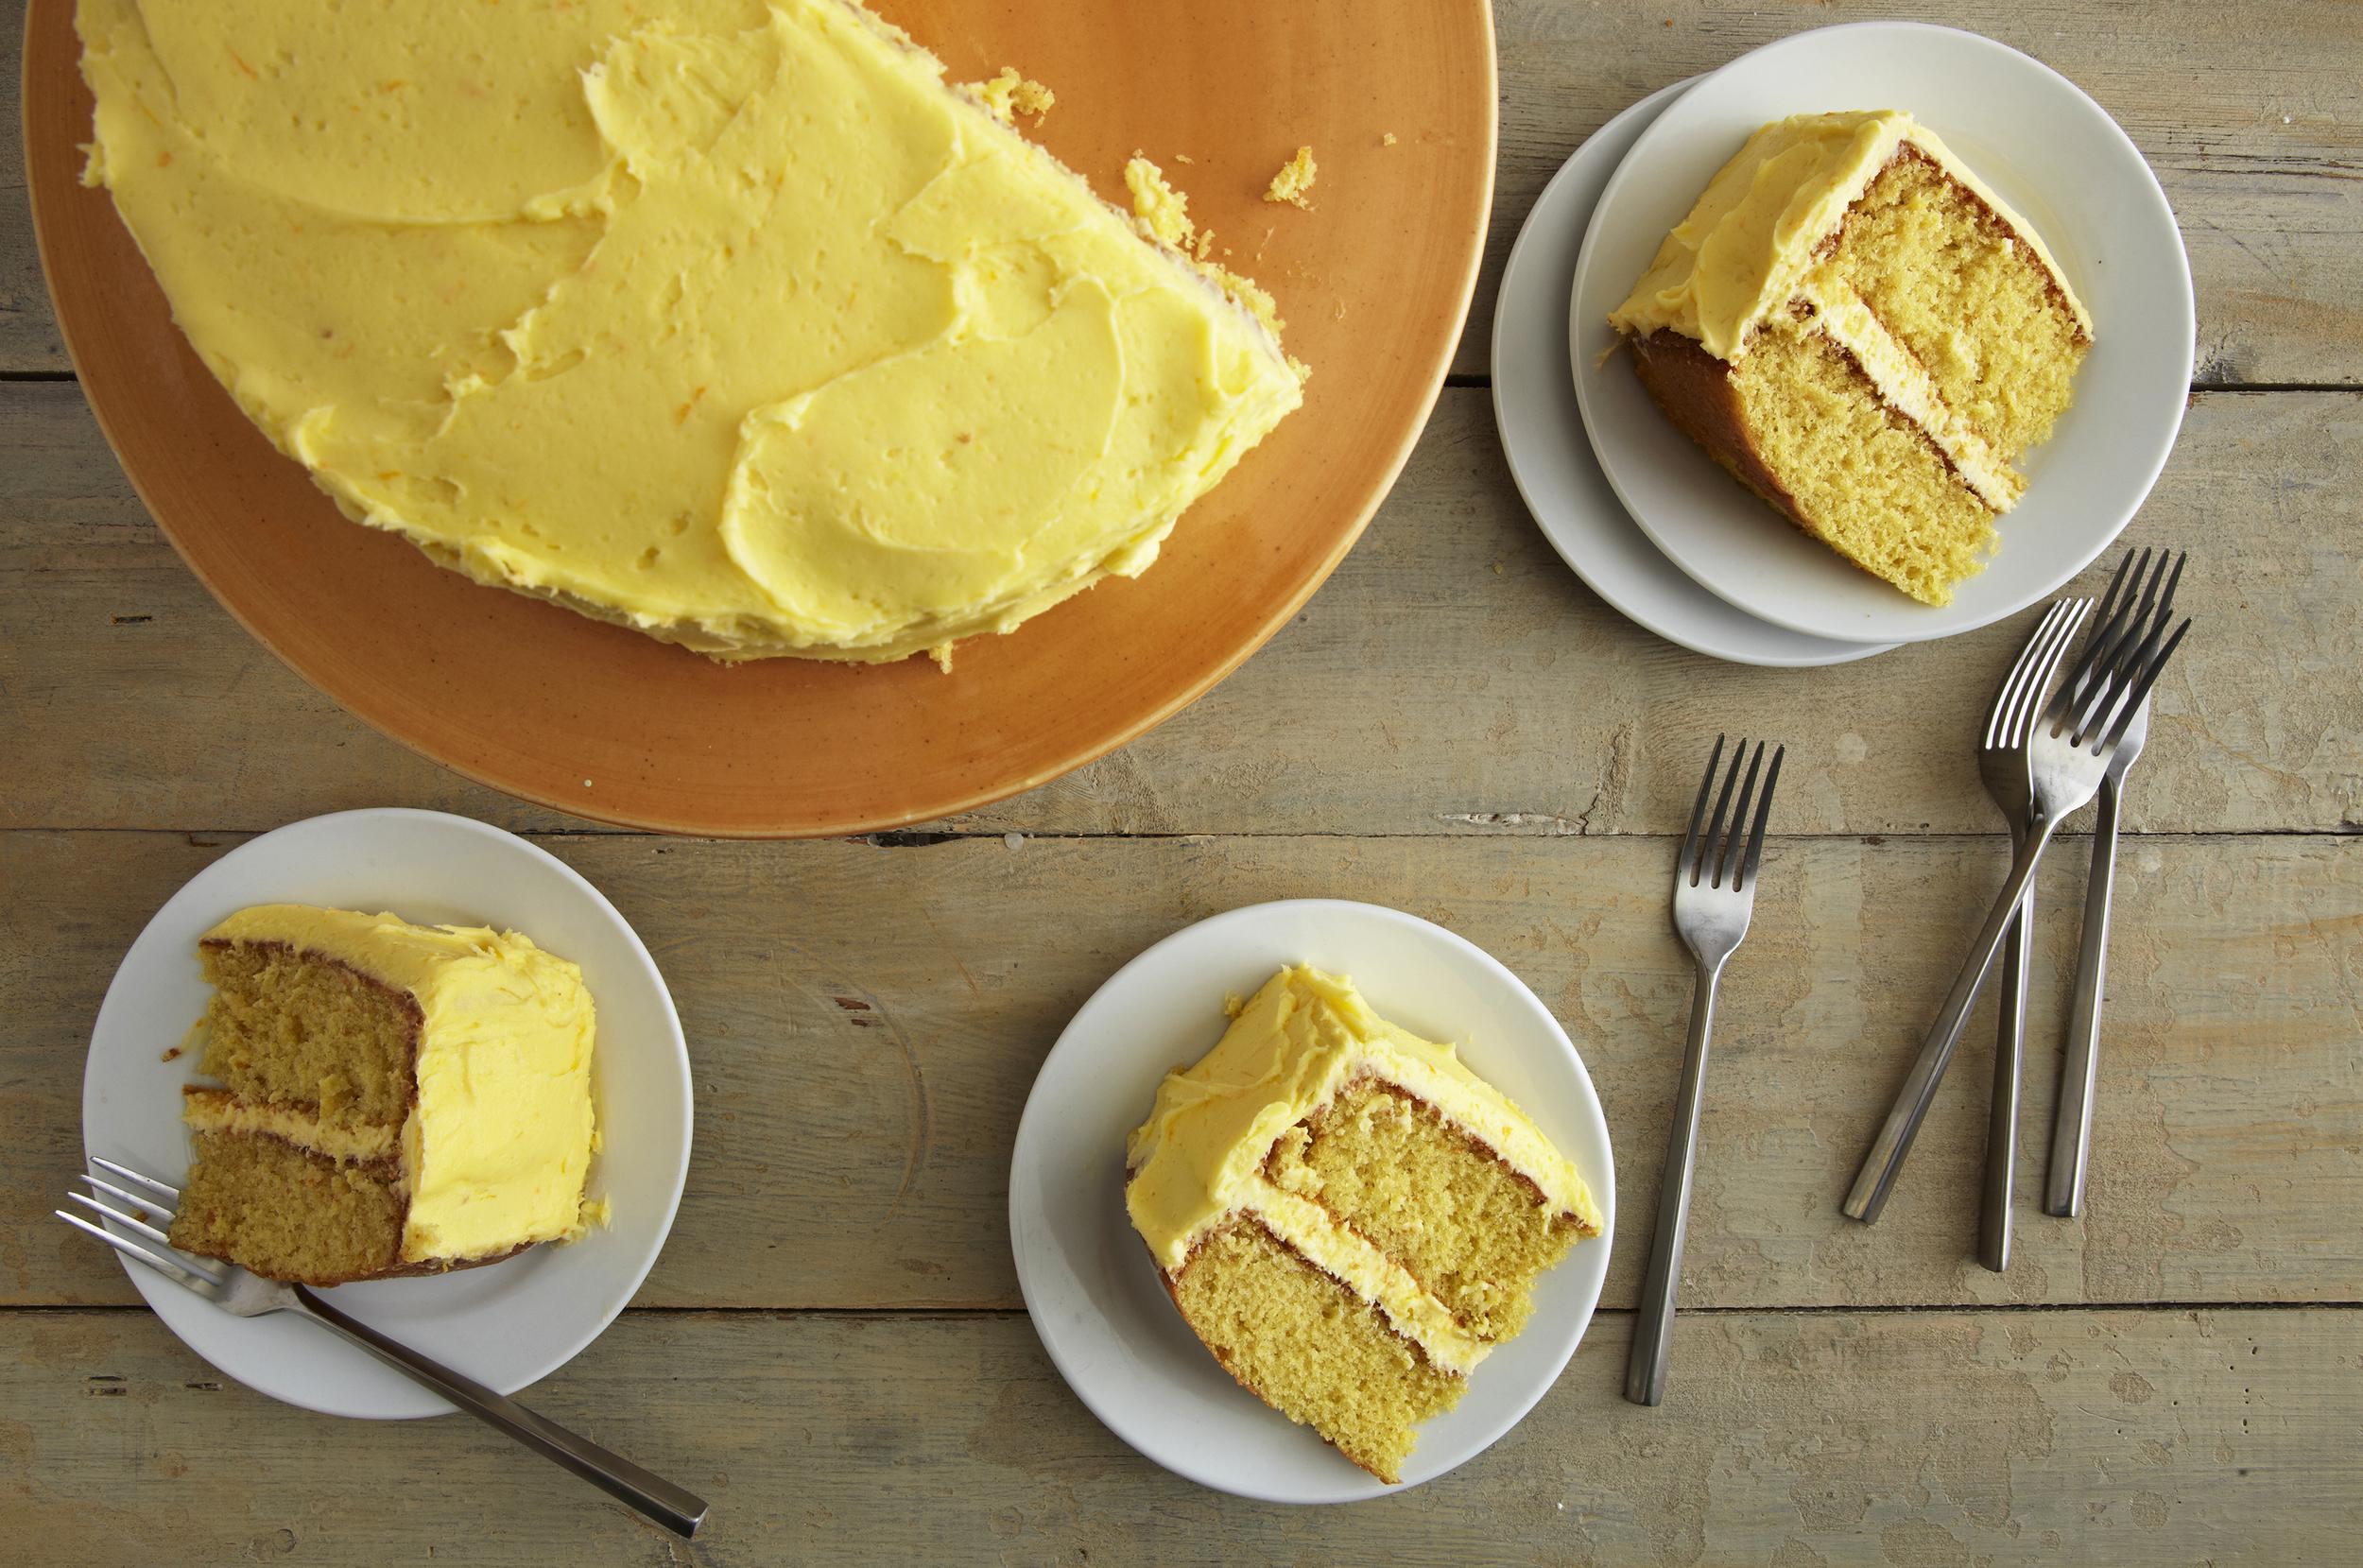 Olive Oil Orange Cake   : A simple moist cake enhanced with the natural sweetness of orange juice, orange zest, and olive oil.